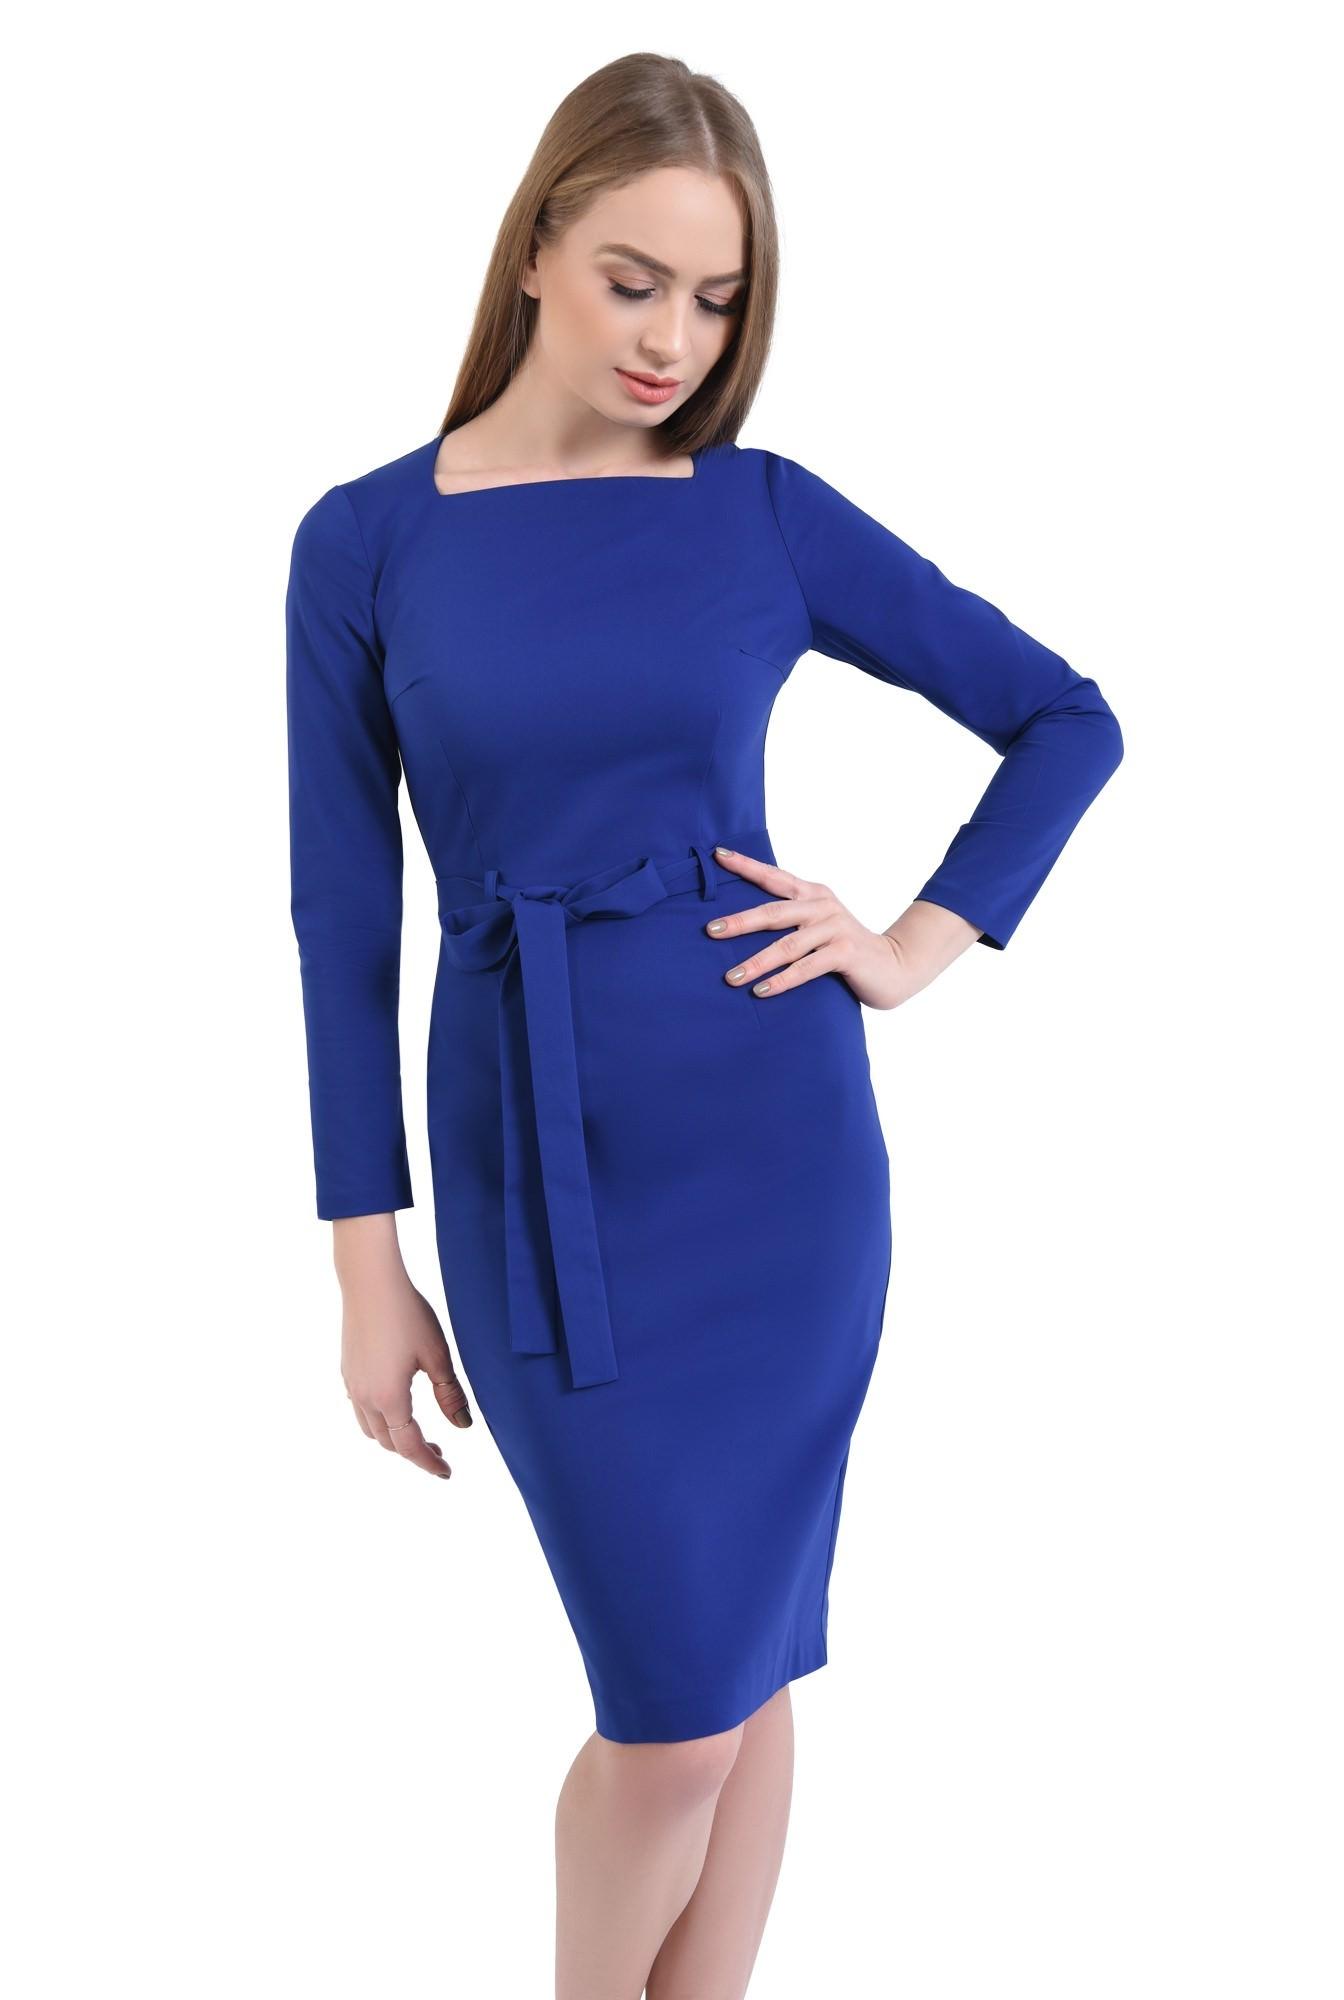 0 - rochie de zi, conica, albastru, cordon